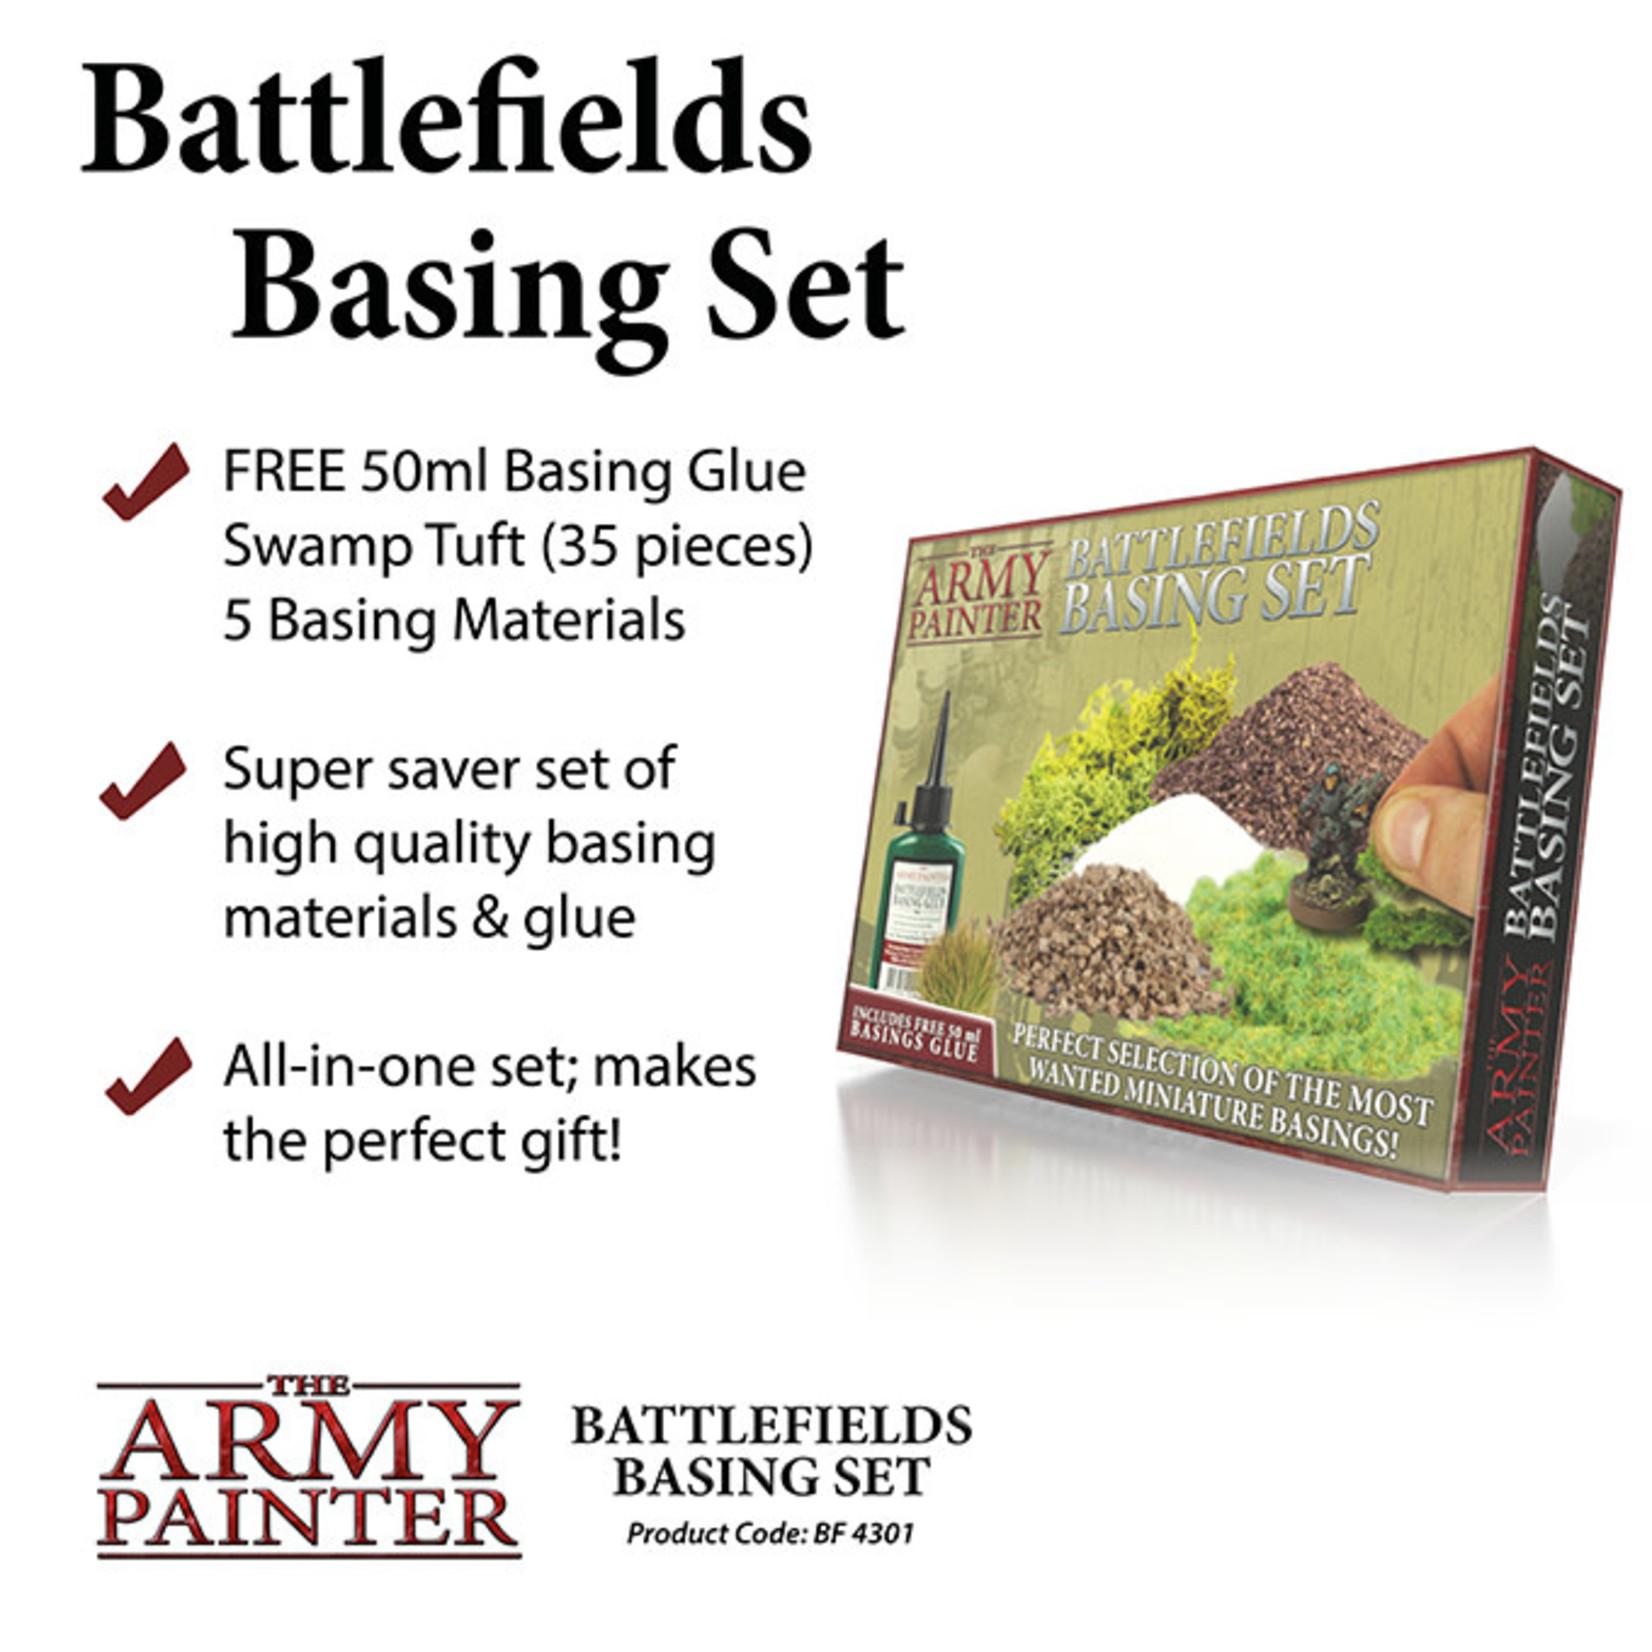 The Army Painter Battlefields Basing Set (2019)